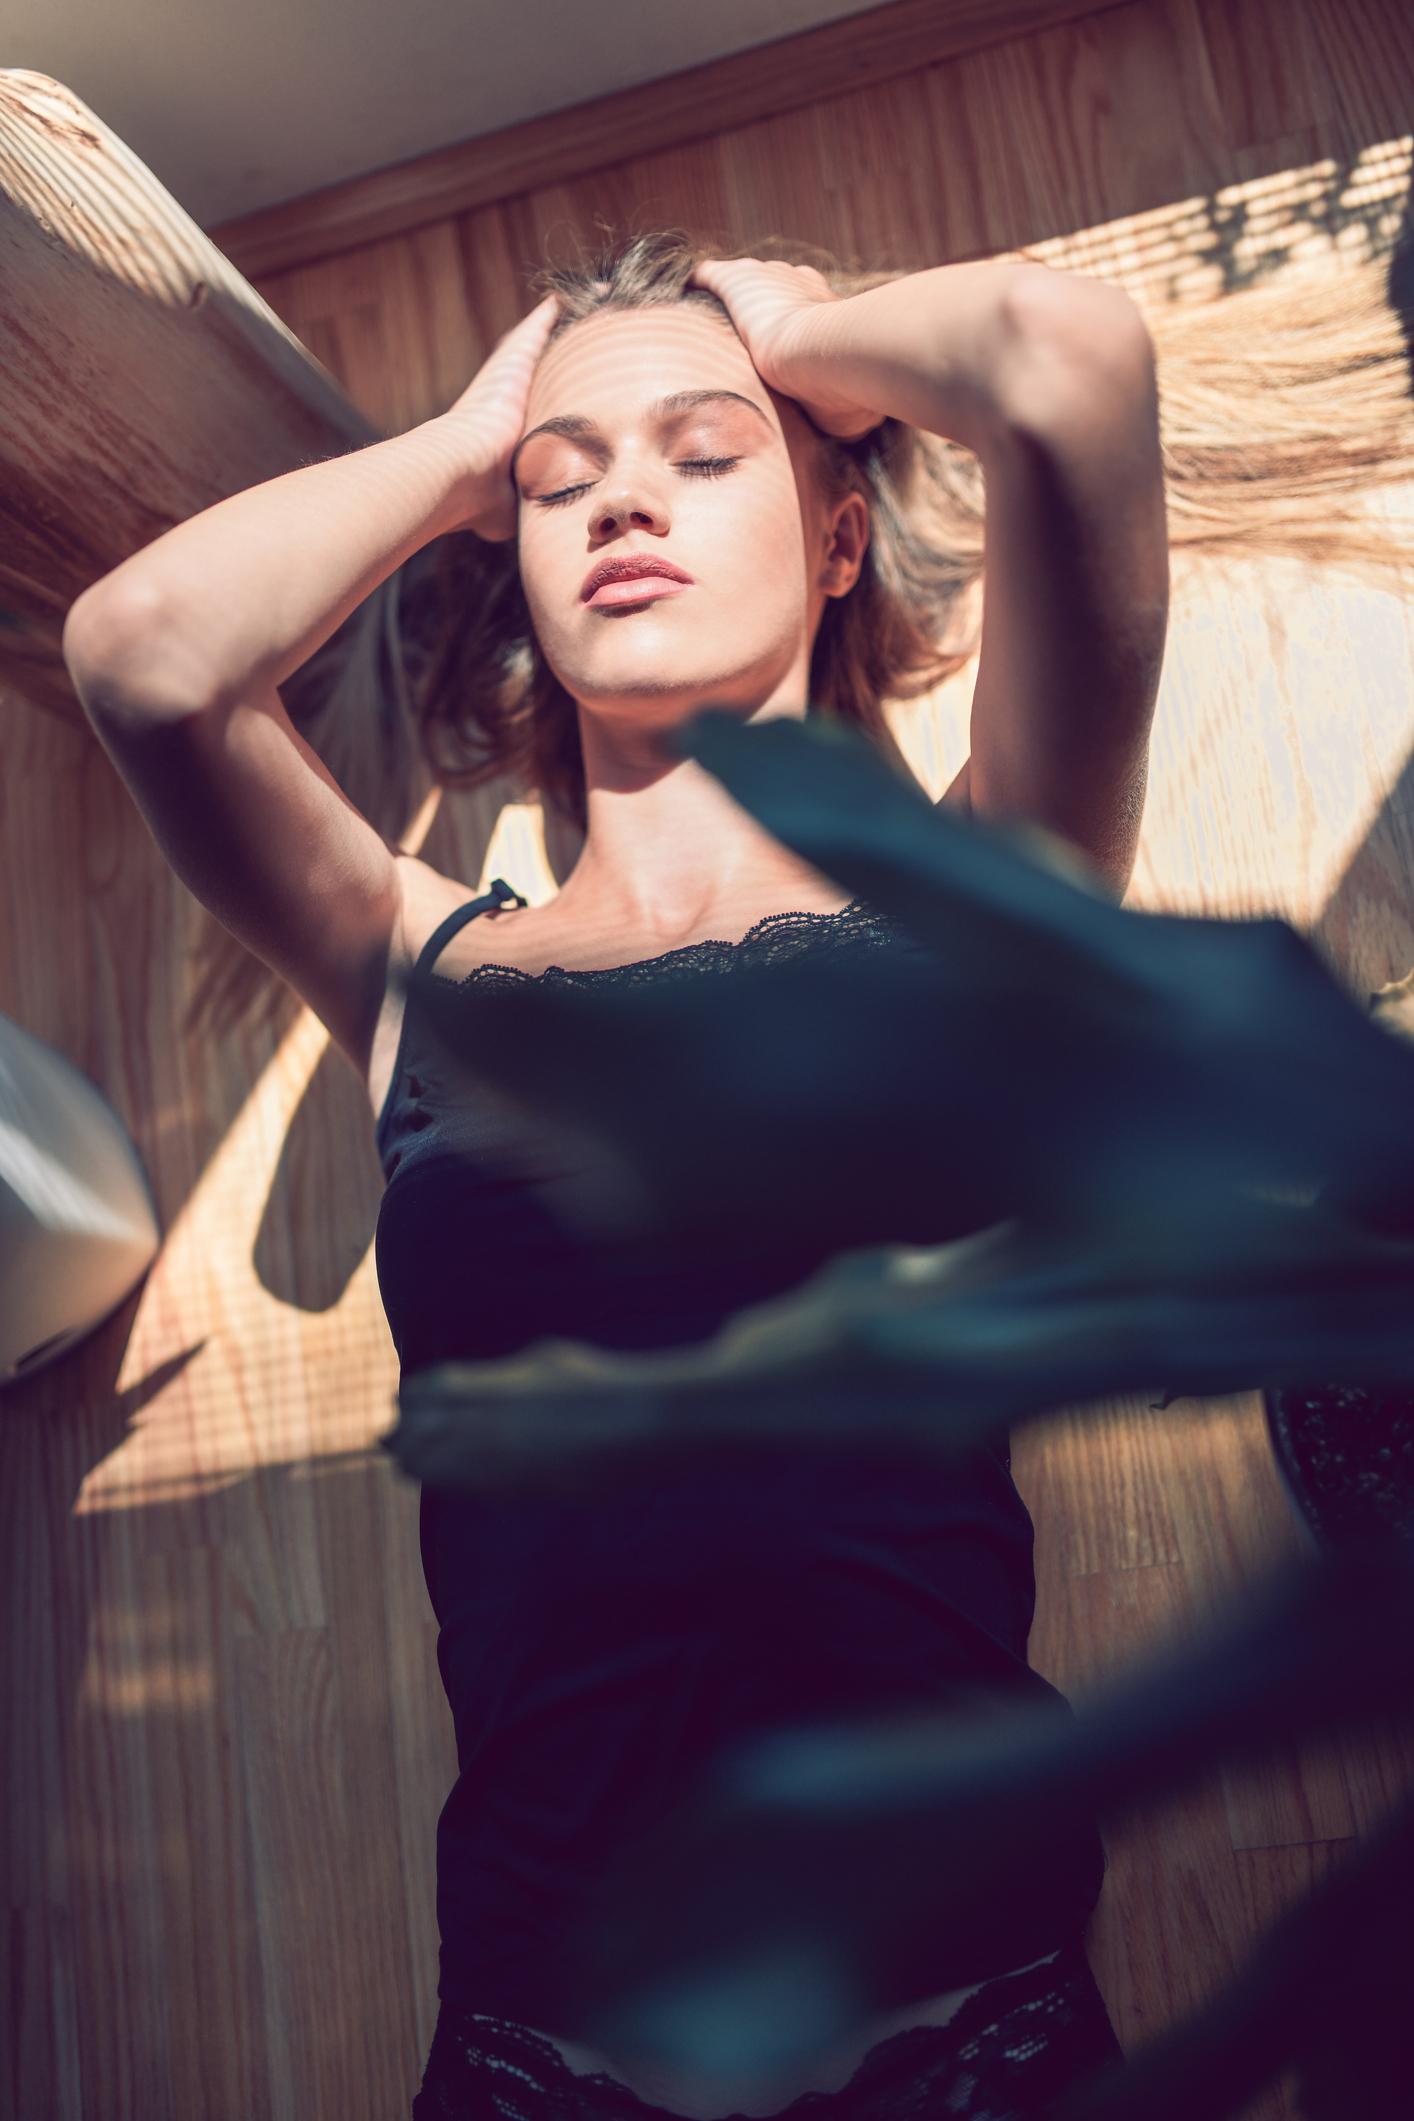 Female Getting Sum Widow Sunlight While Lying On Floor